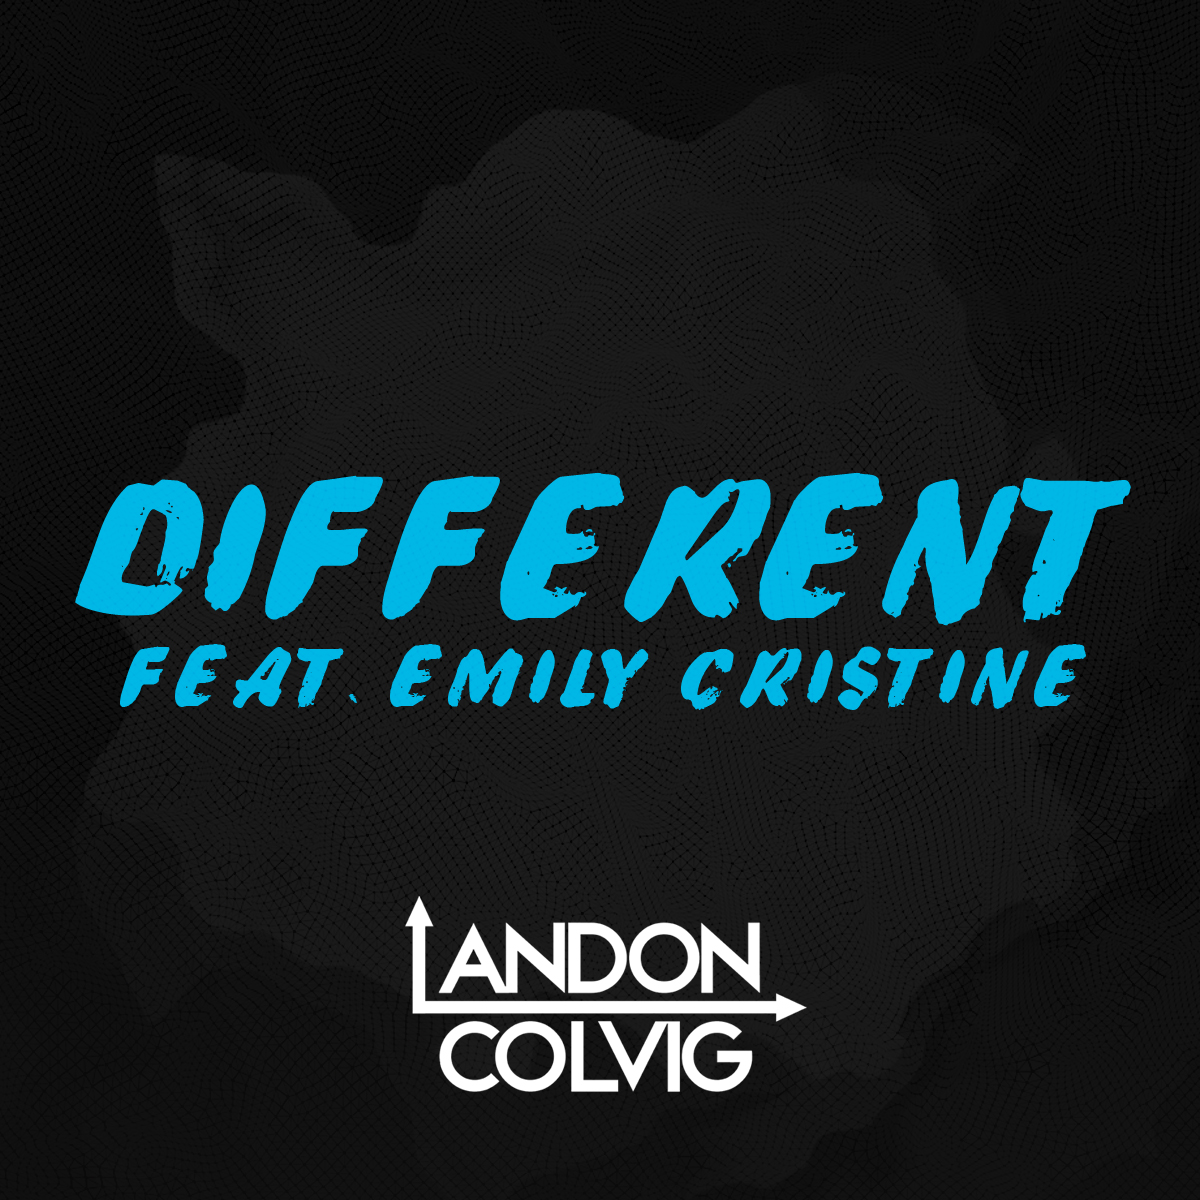 Landon Colvig feat. Emily Cristine - Different